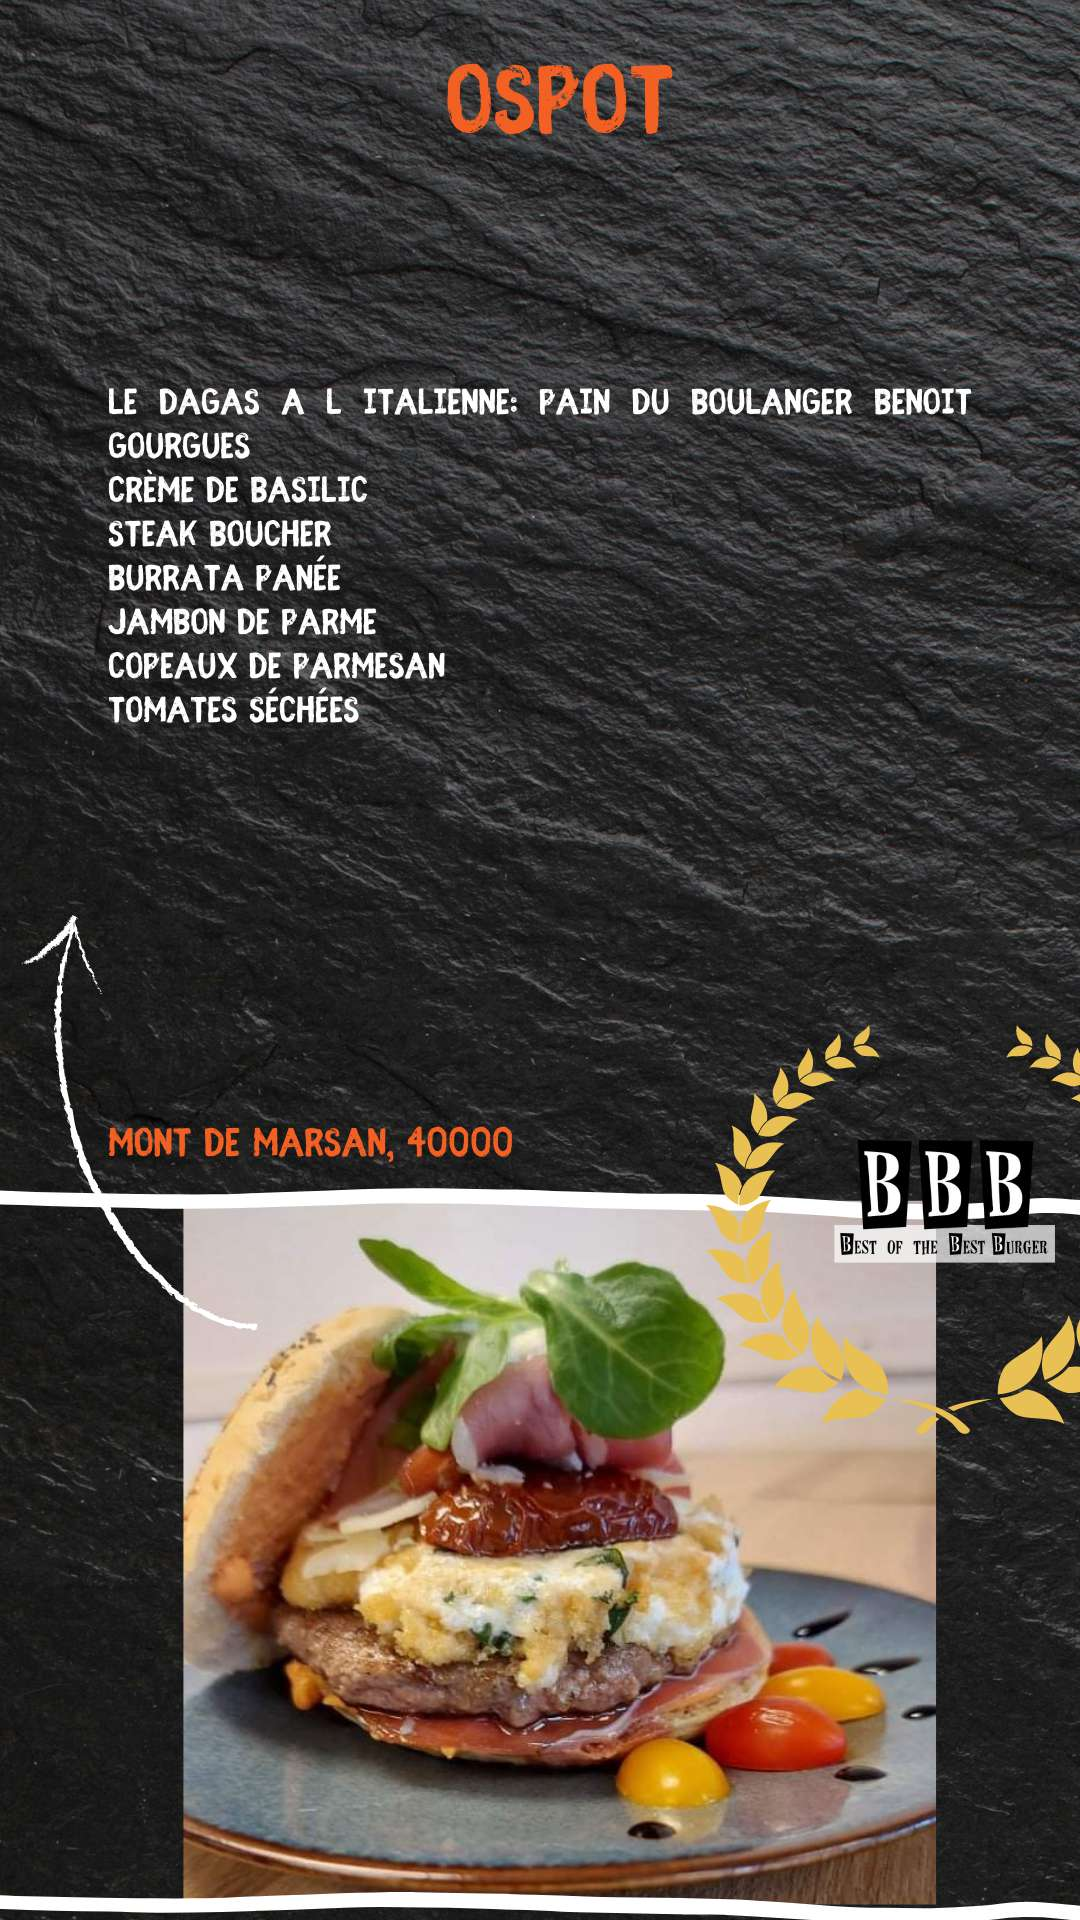 Burger de Ospot